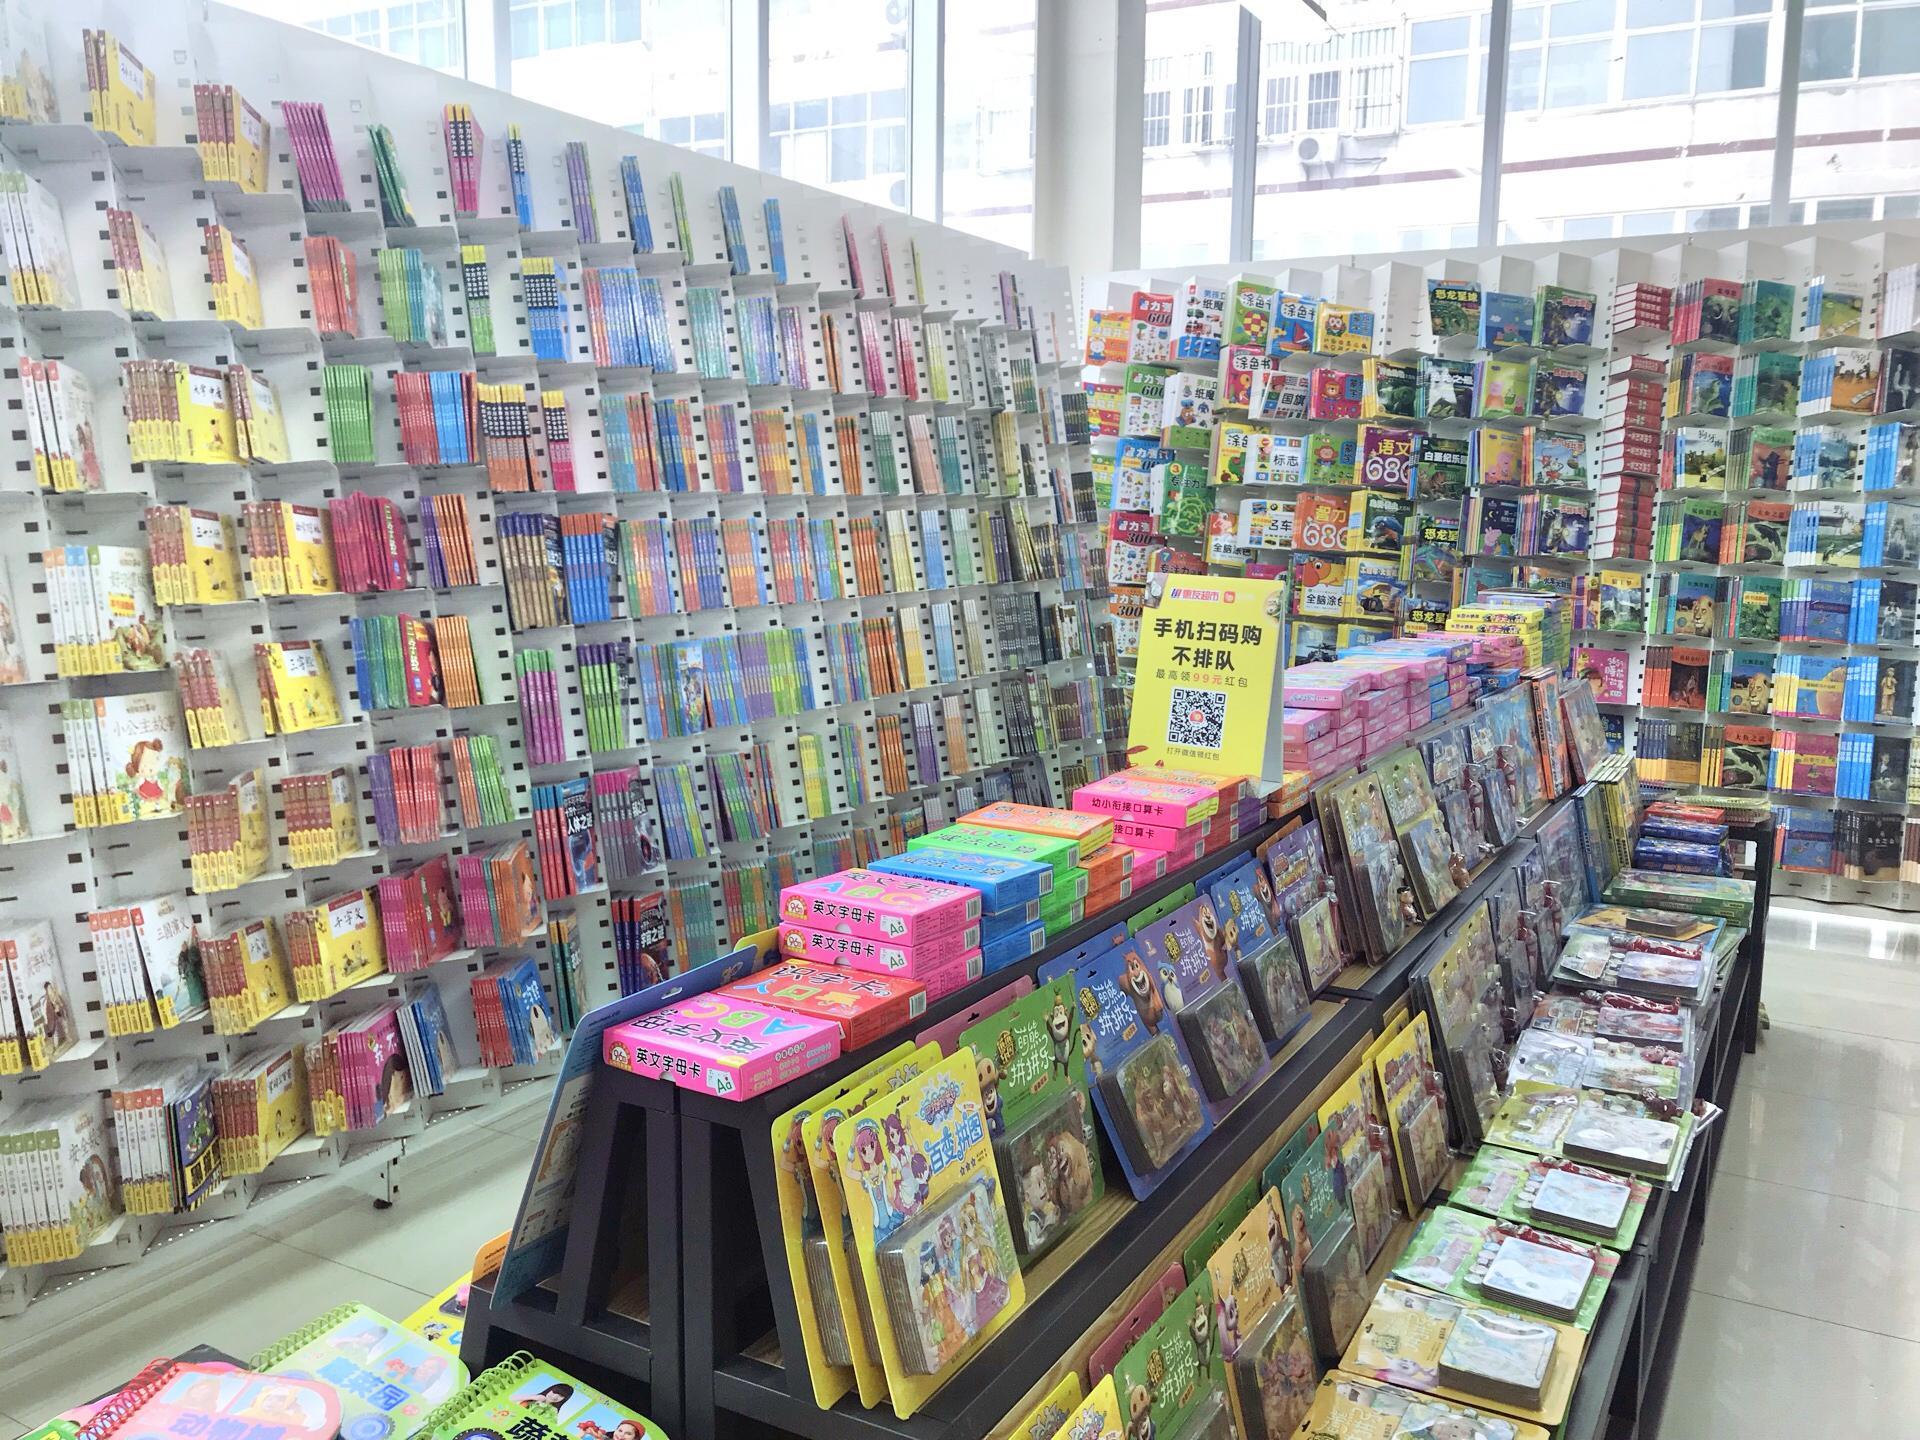 Liangping Bookstore